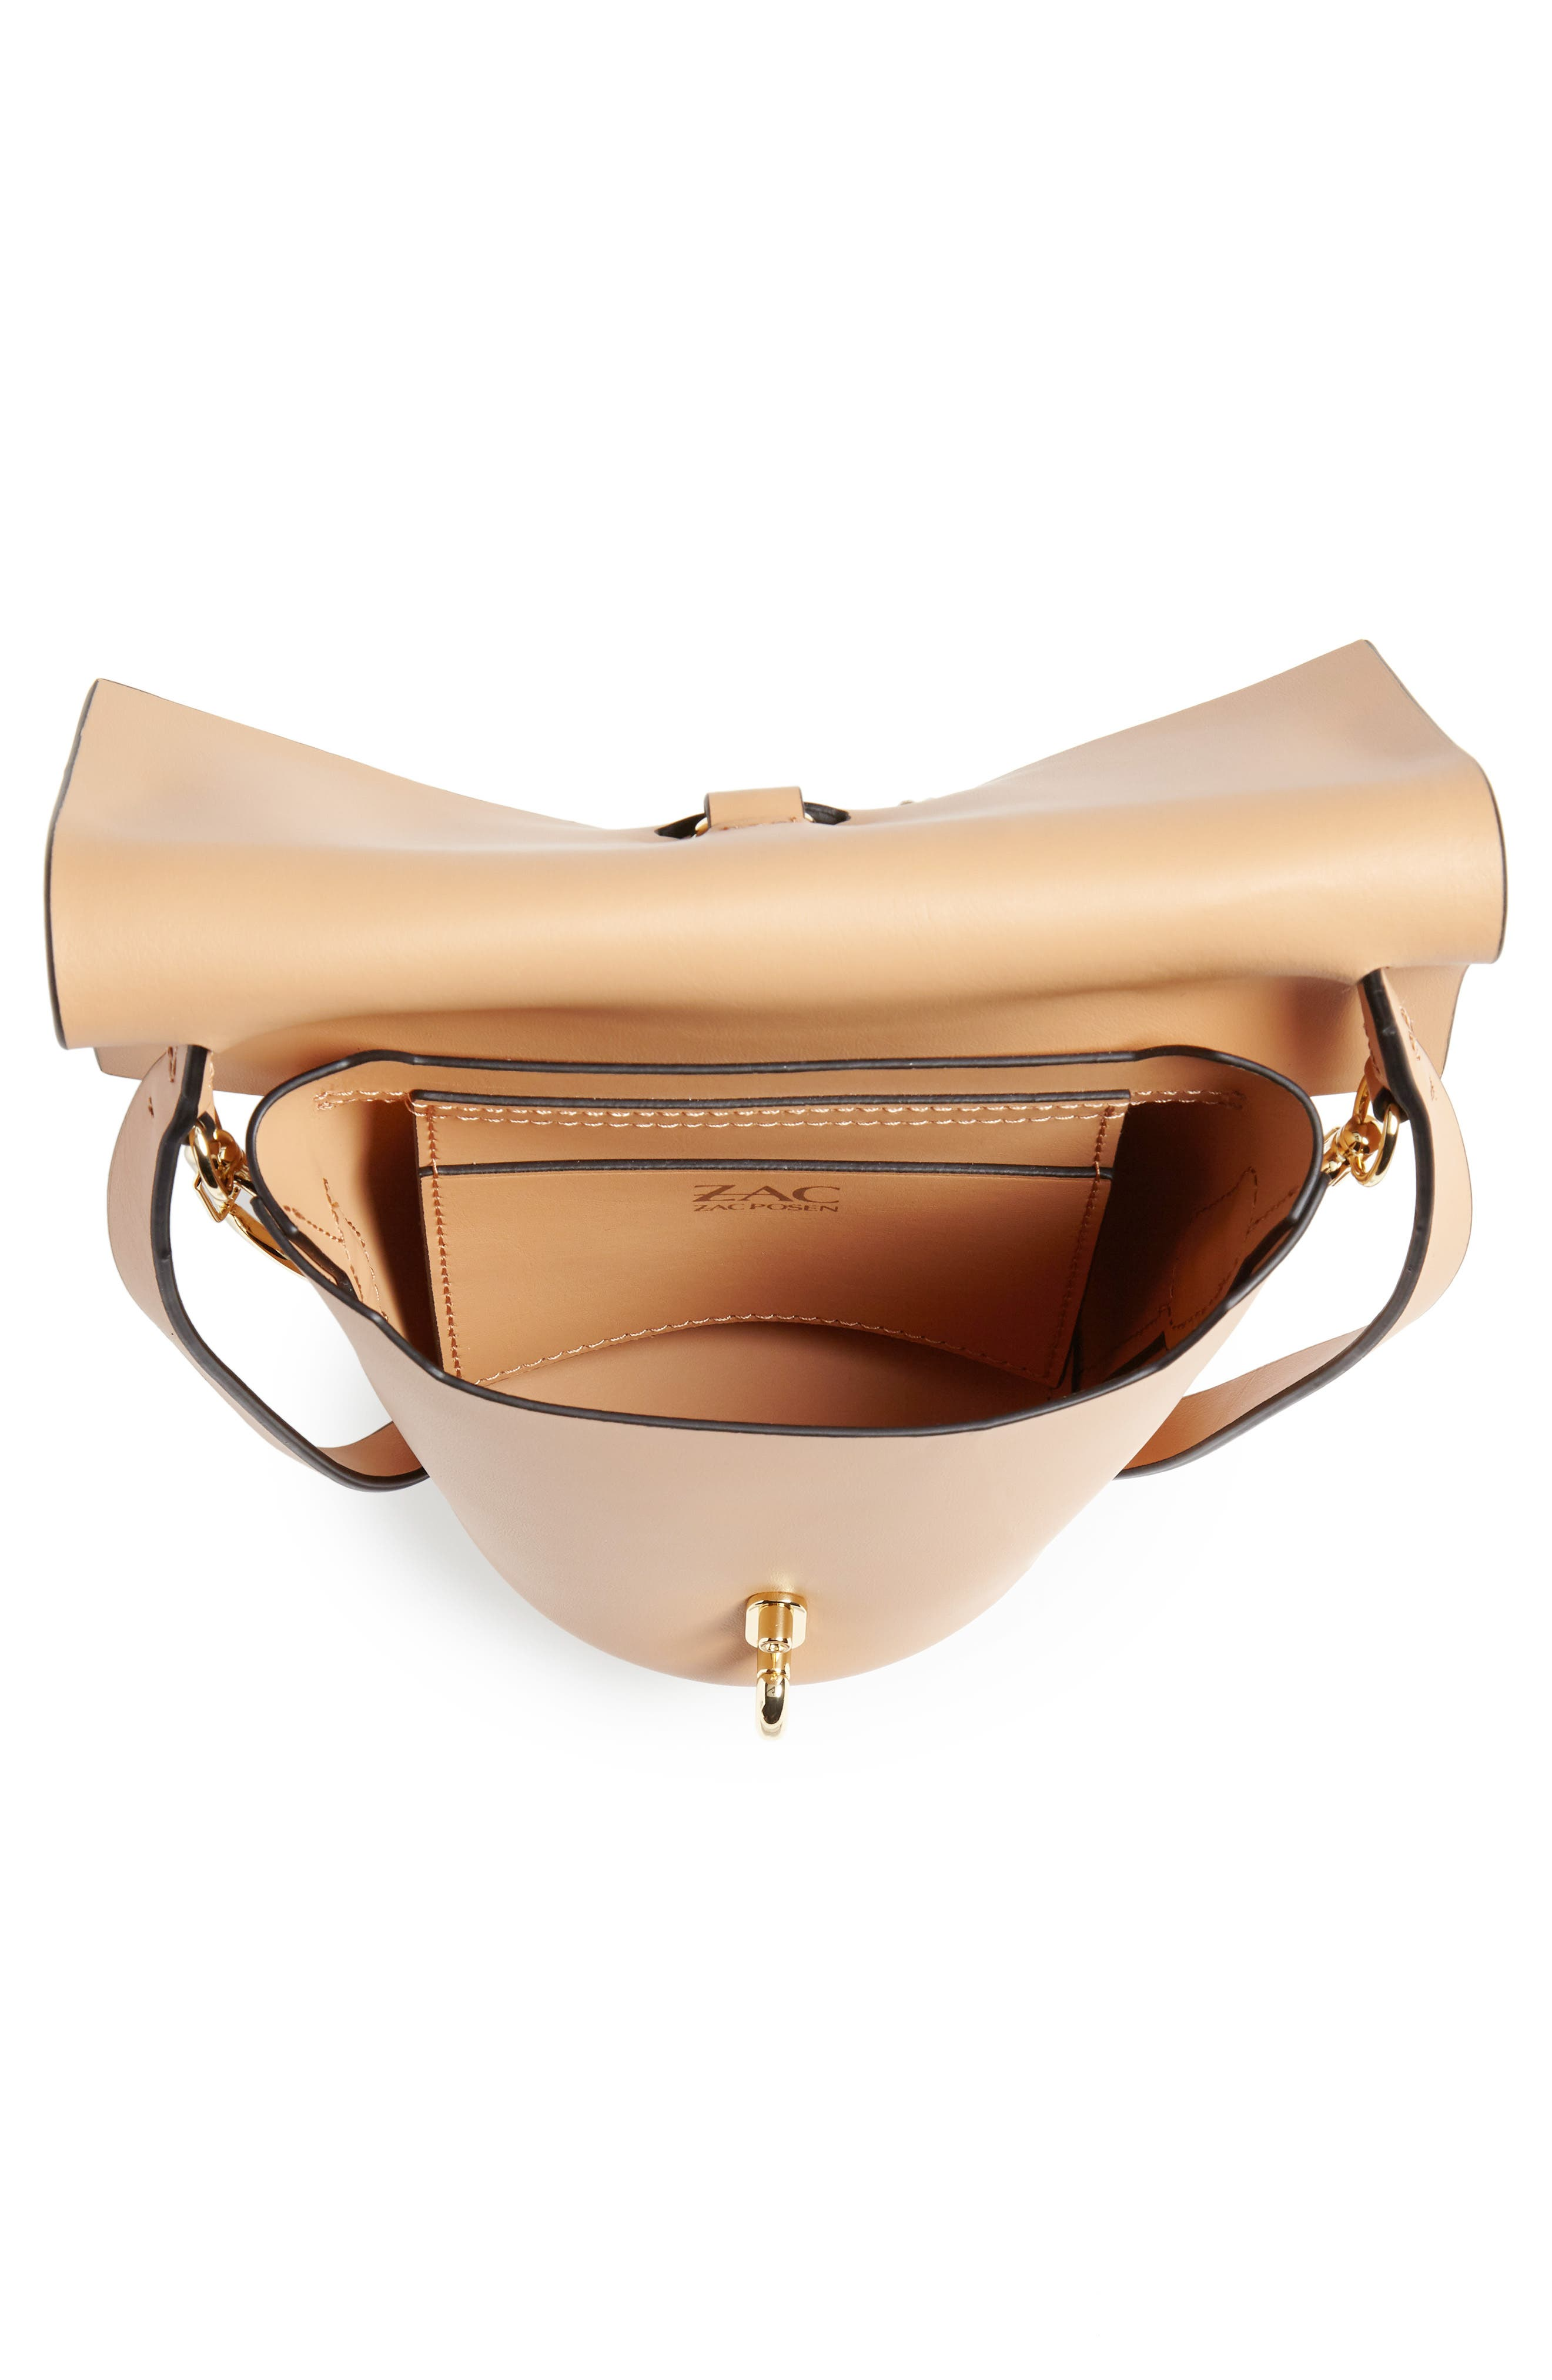 Mini Belay Calfskin Leather Crossbody Bucket Bag,                             Alternate thumbnail 4, color,                             Vachetta